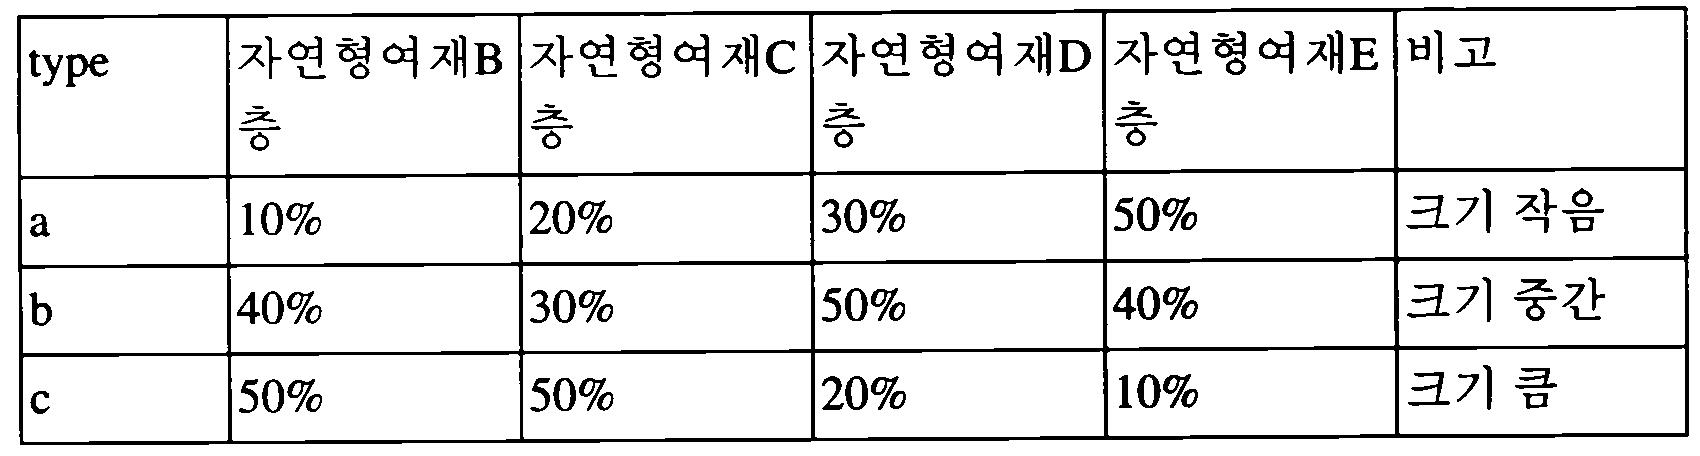 Figure 112014001595111-pat00001